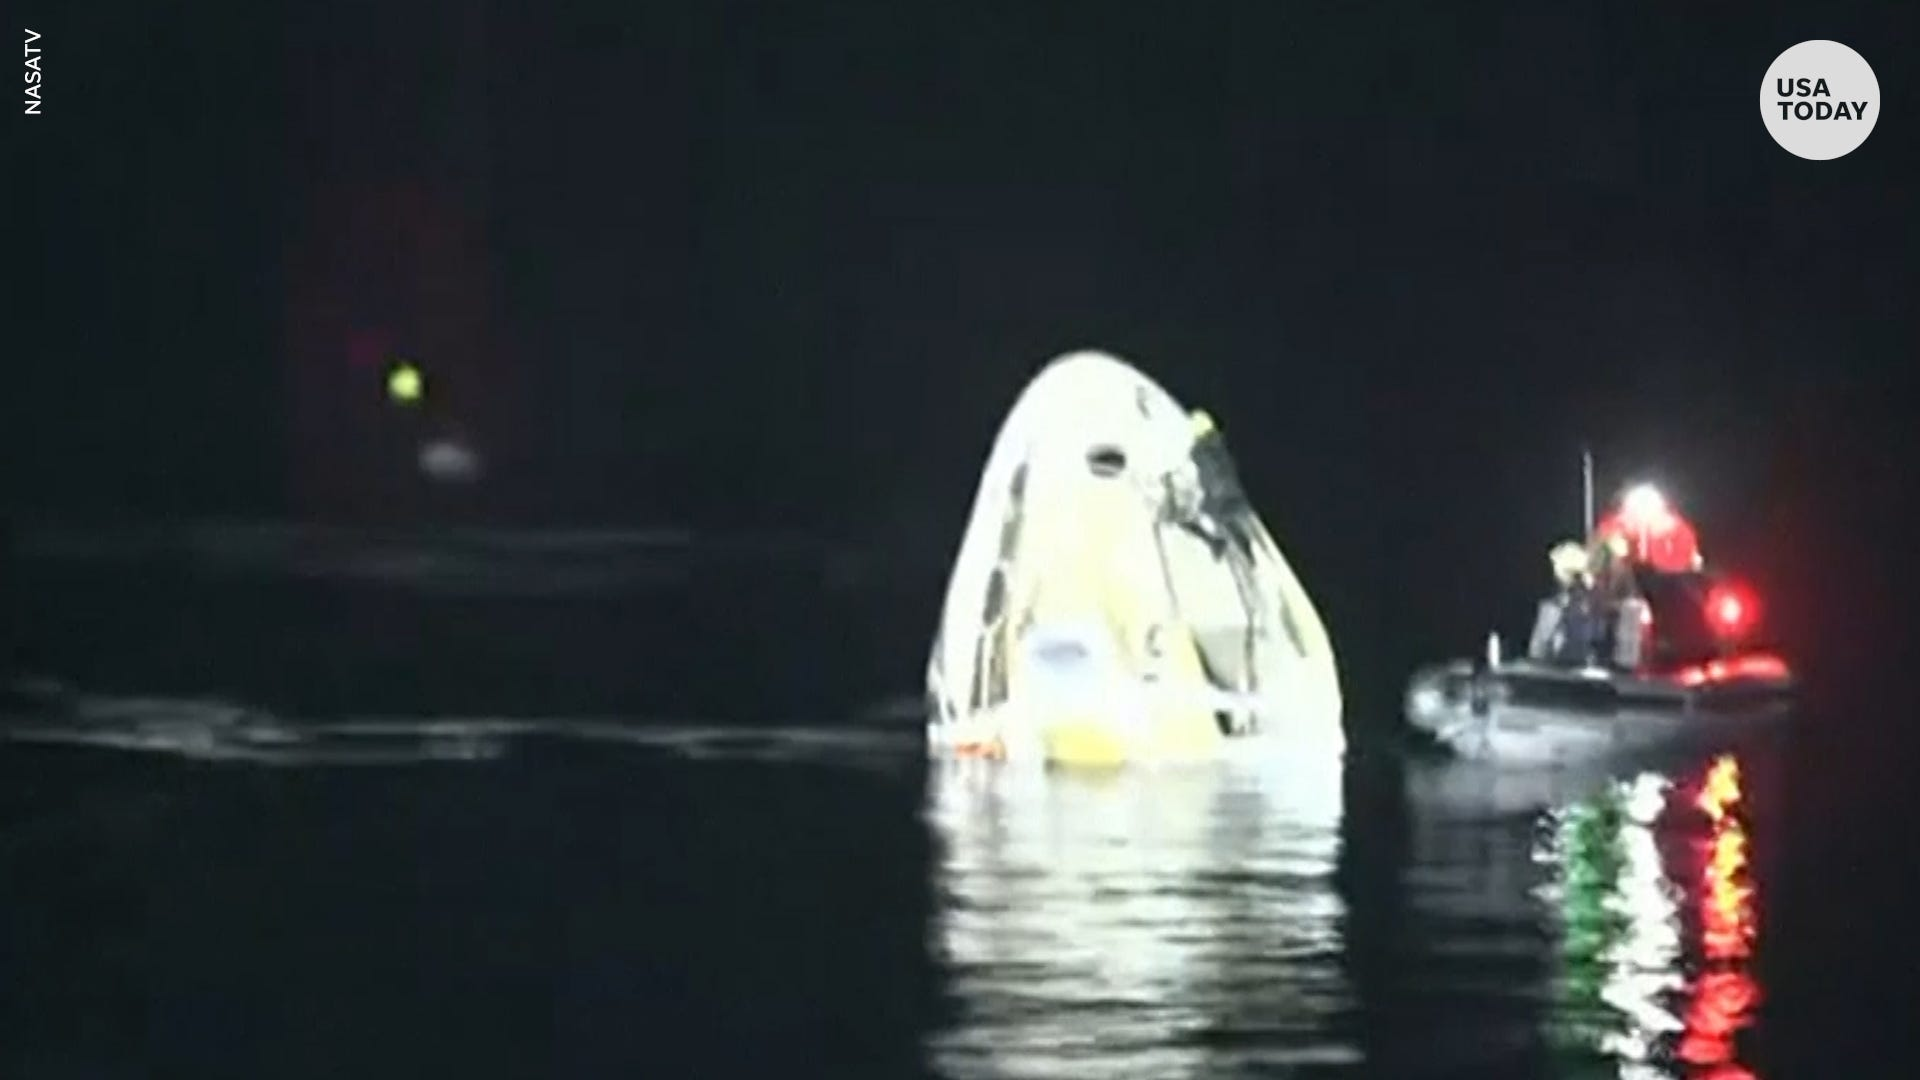 NASA astronauts return to Earth in first nighttime splashdown since Apollo 8